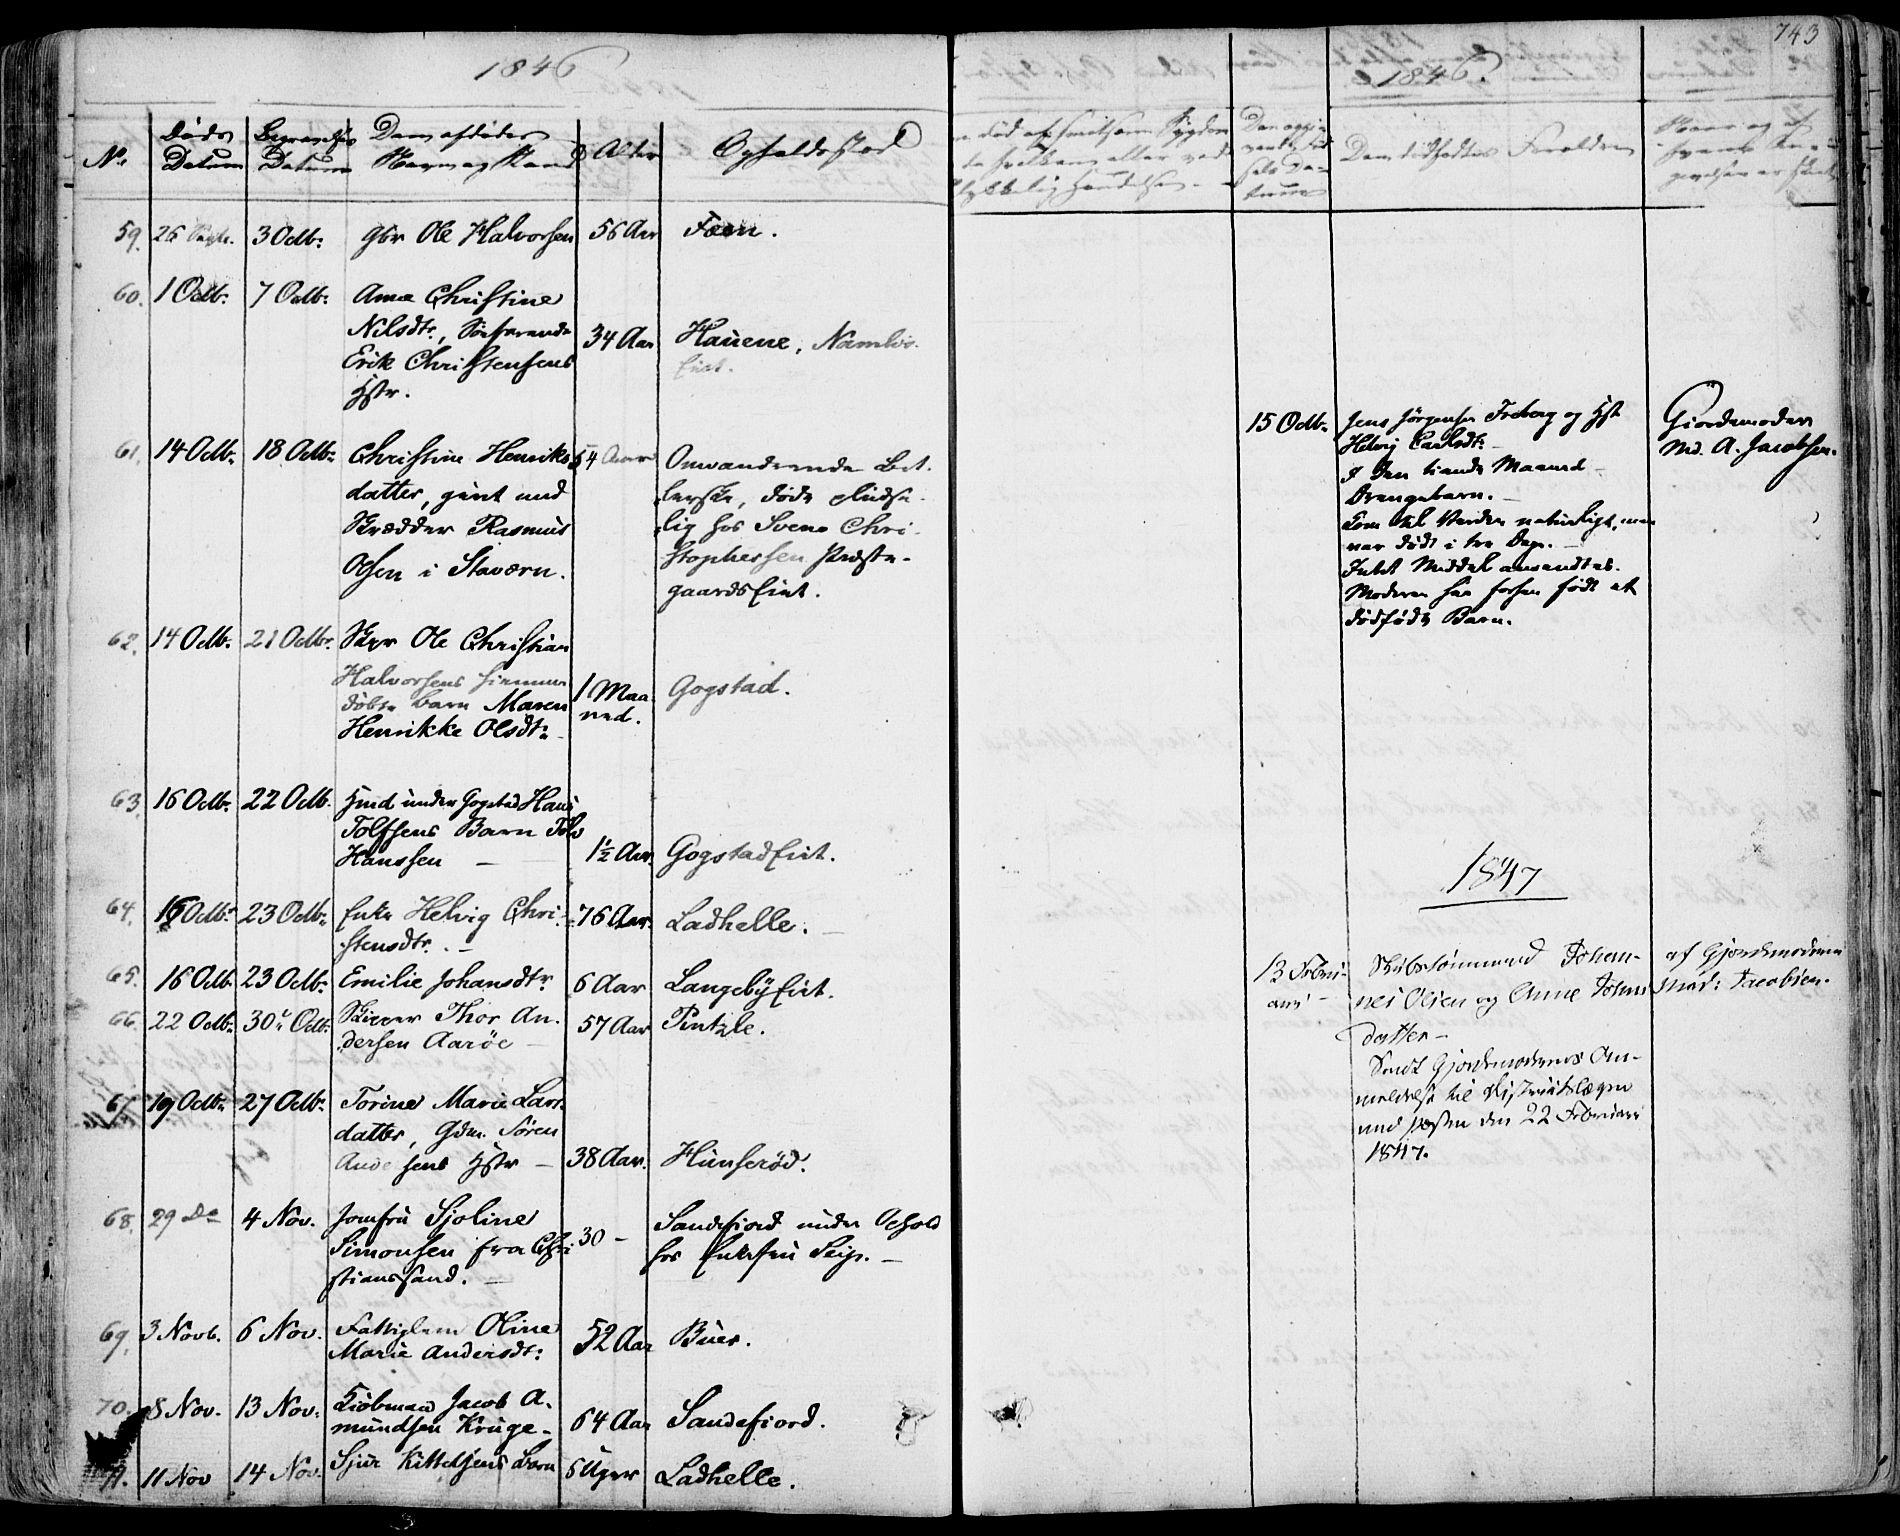 SAKO, Sandar kirkebøker, F/Fa/L0005: Parish register (official) no. 5, 1832-1847, p. 742-743